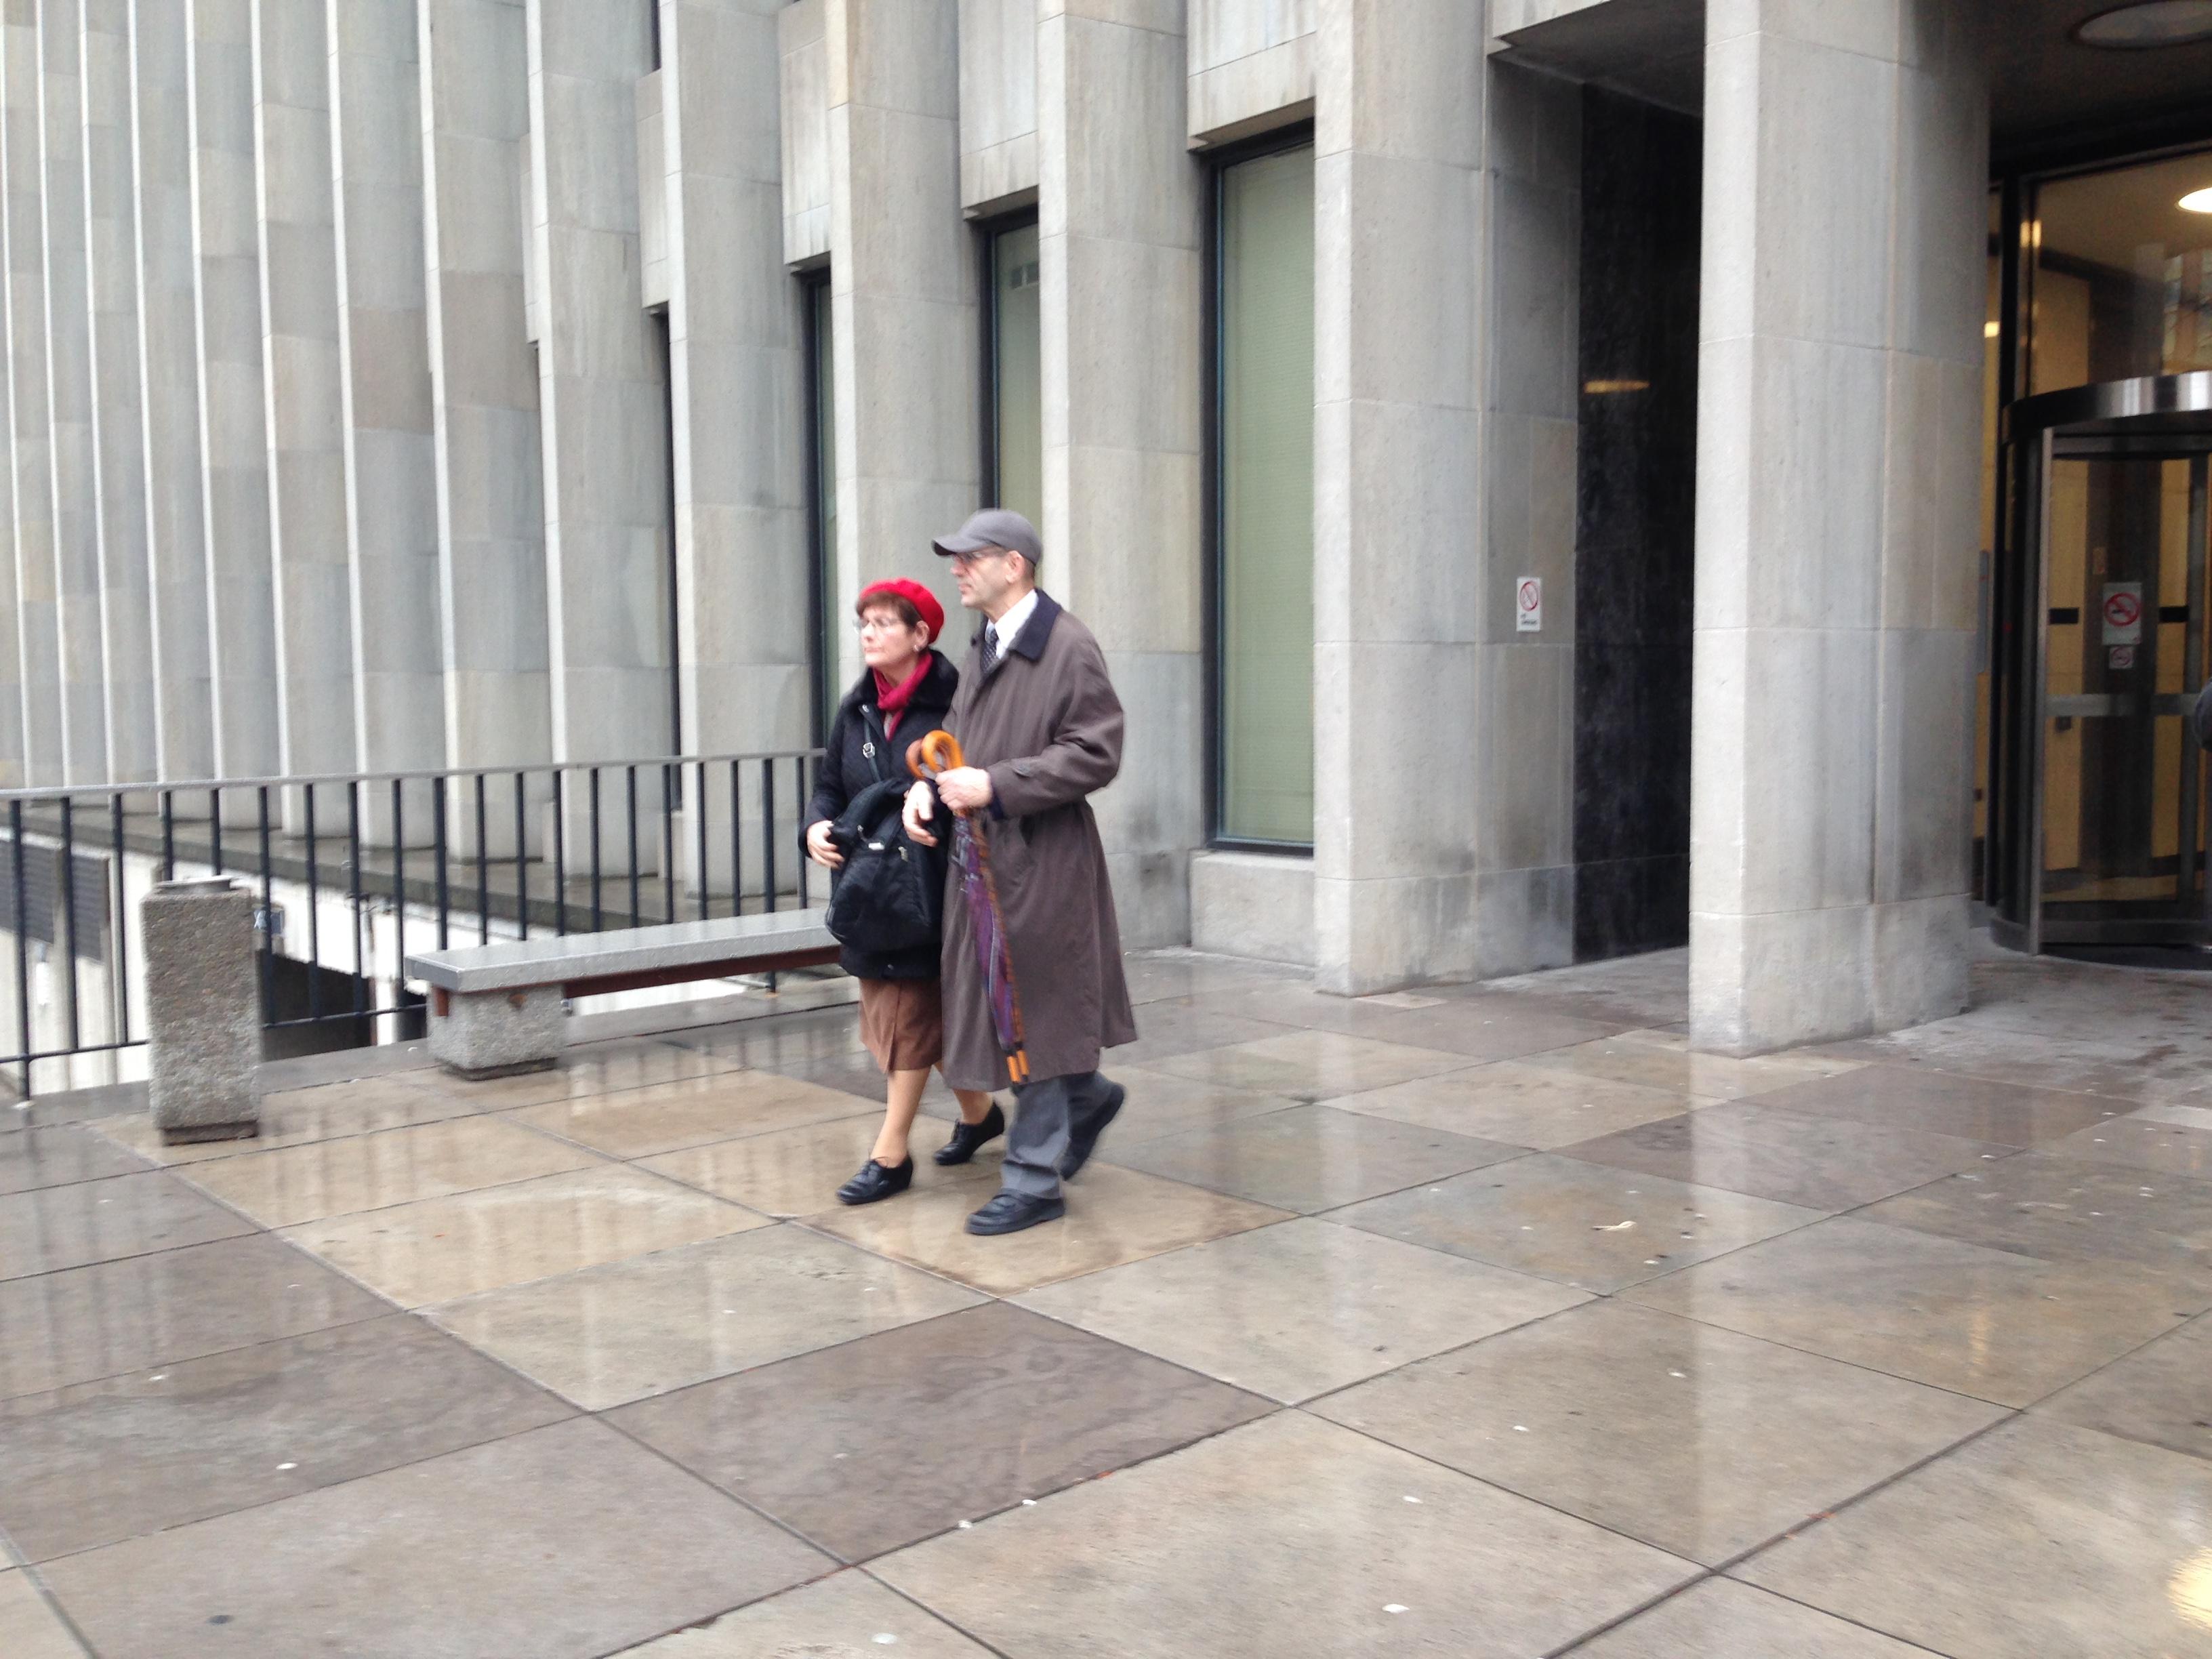 Tom Samson's parents, Gita and Uri Samson, leave court, on Dec. 21. 2015. CITYNEWS/Marianne Boucher.